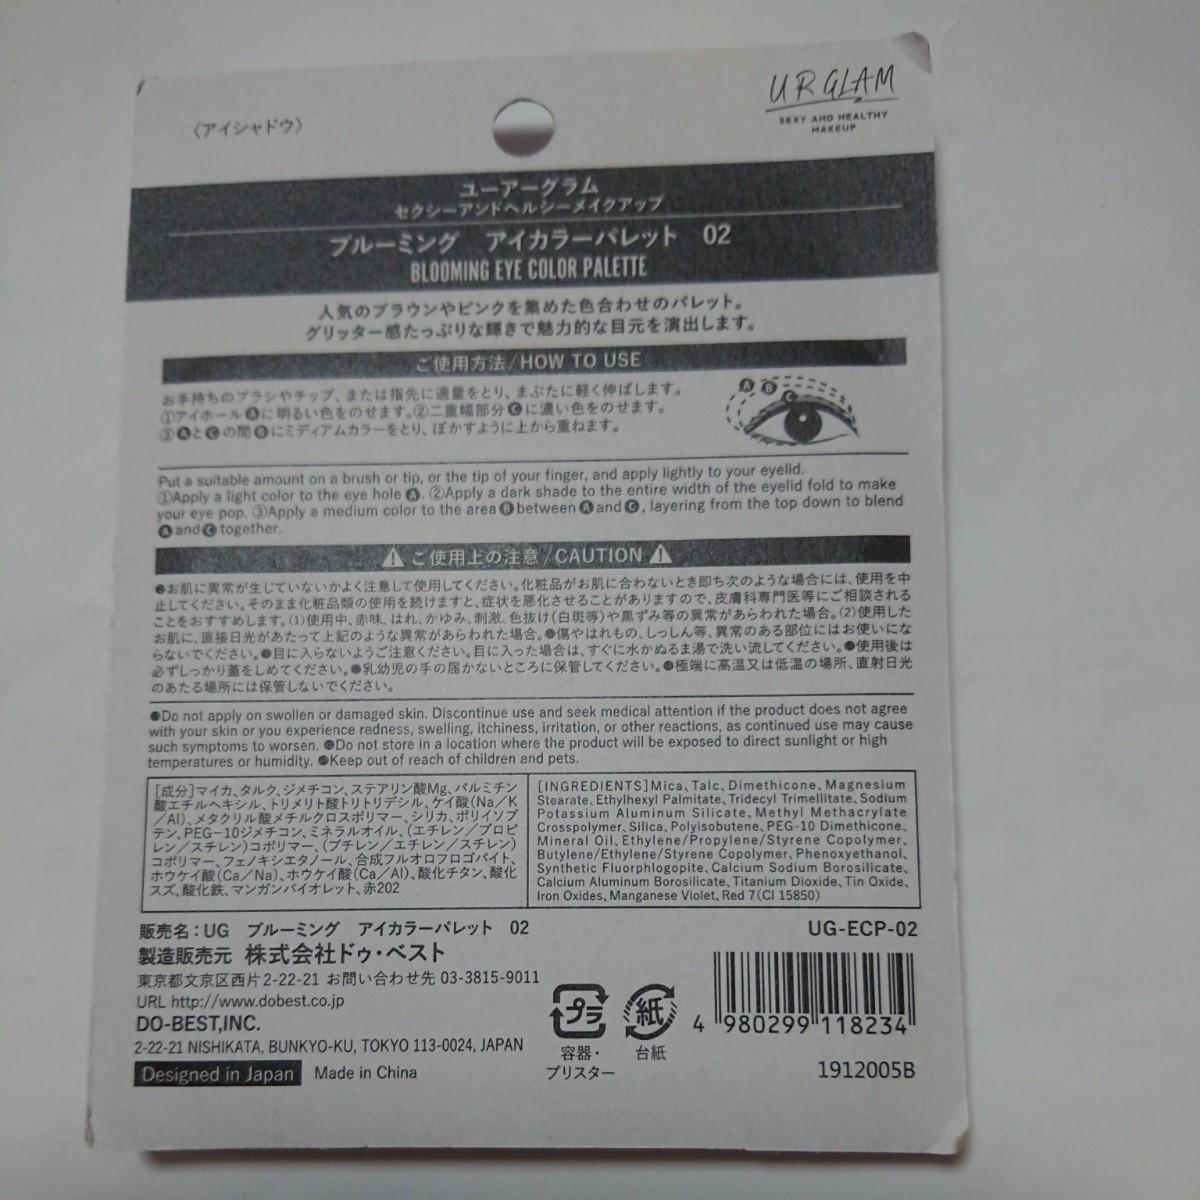 URGLAM ユーアーグラム ブルーミングアイカラーパレット  02&04